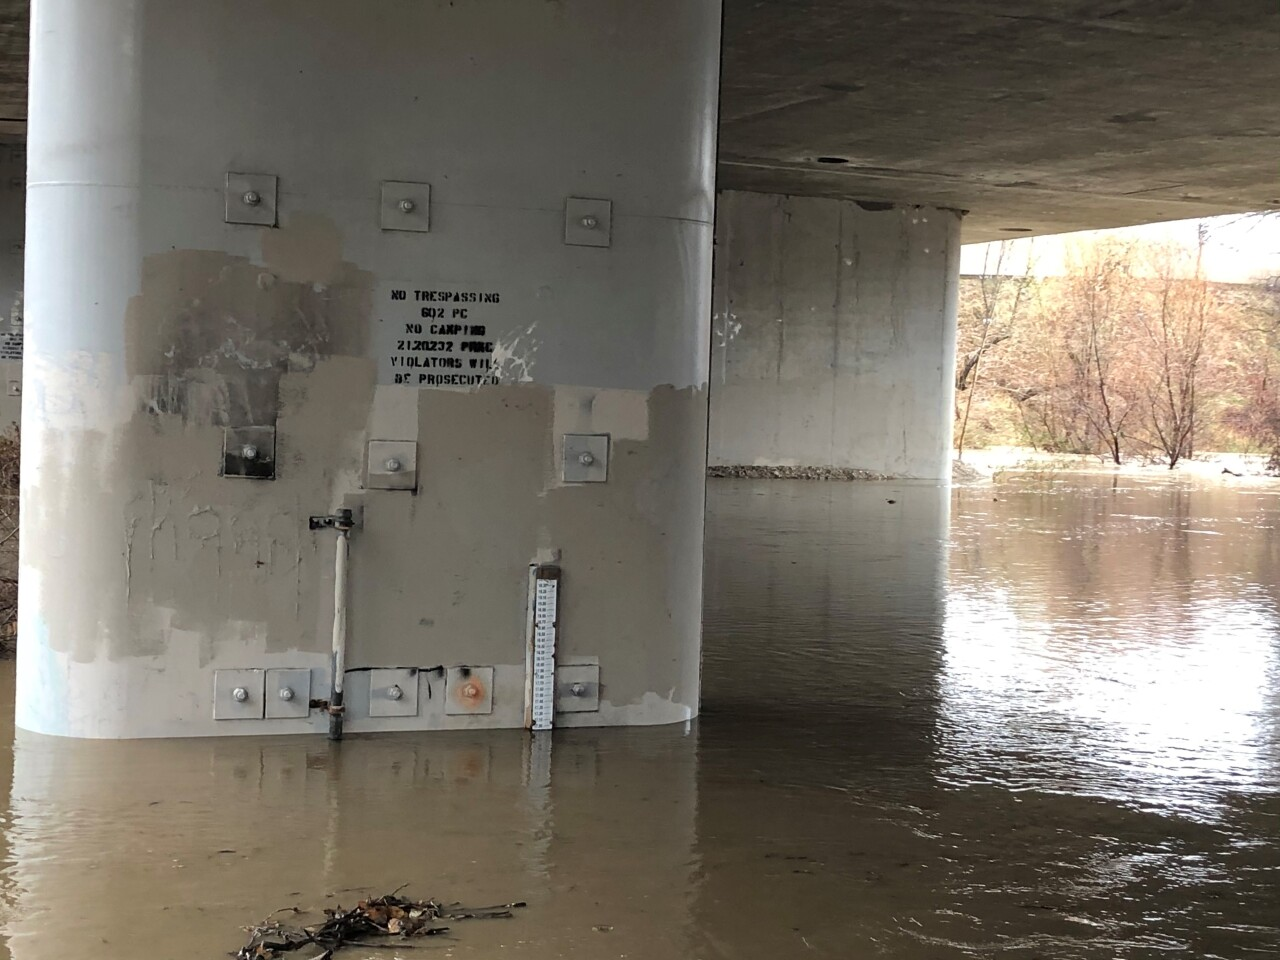 13th street bridge water.jpg